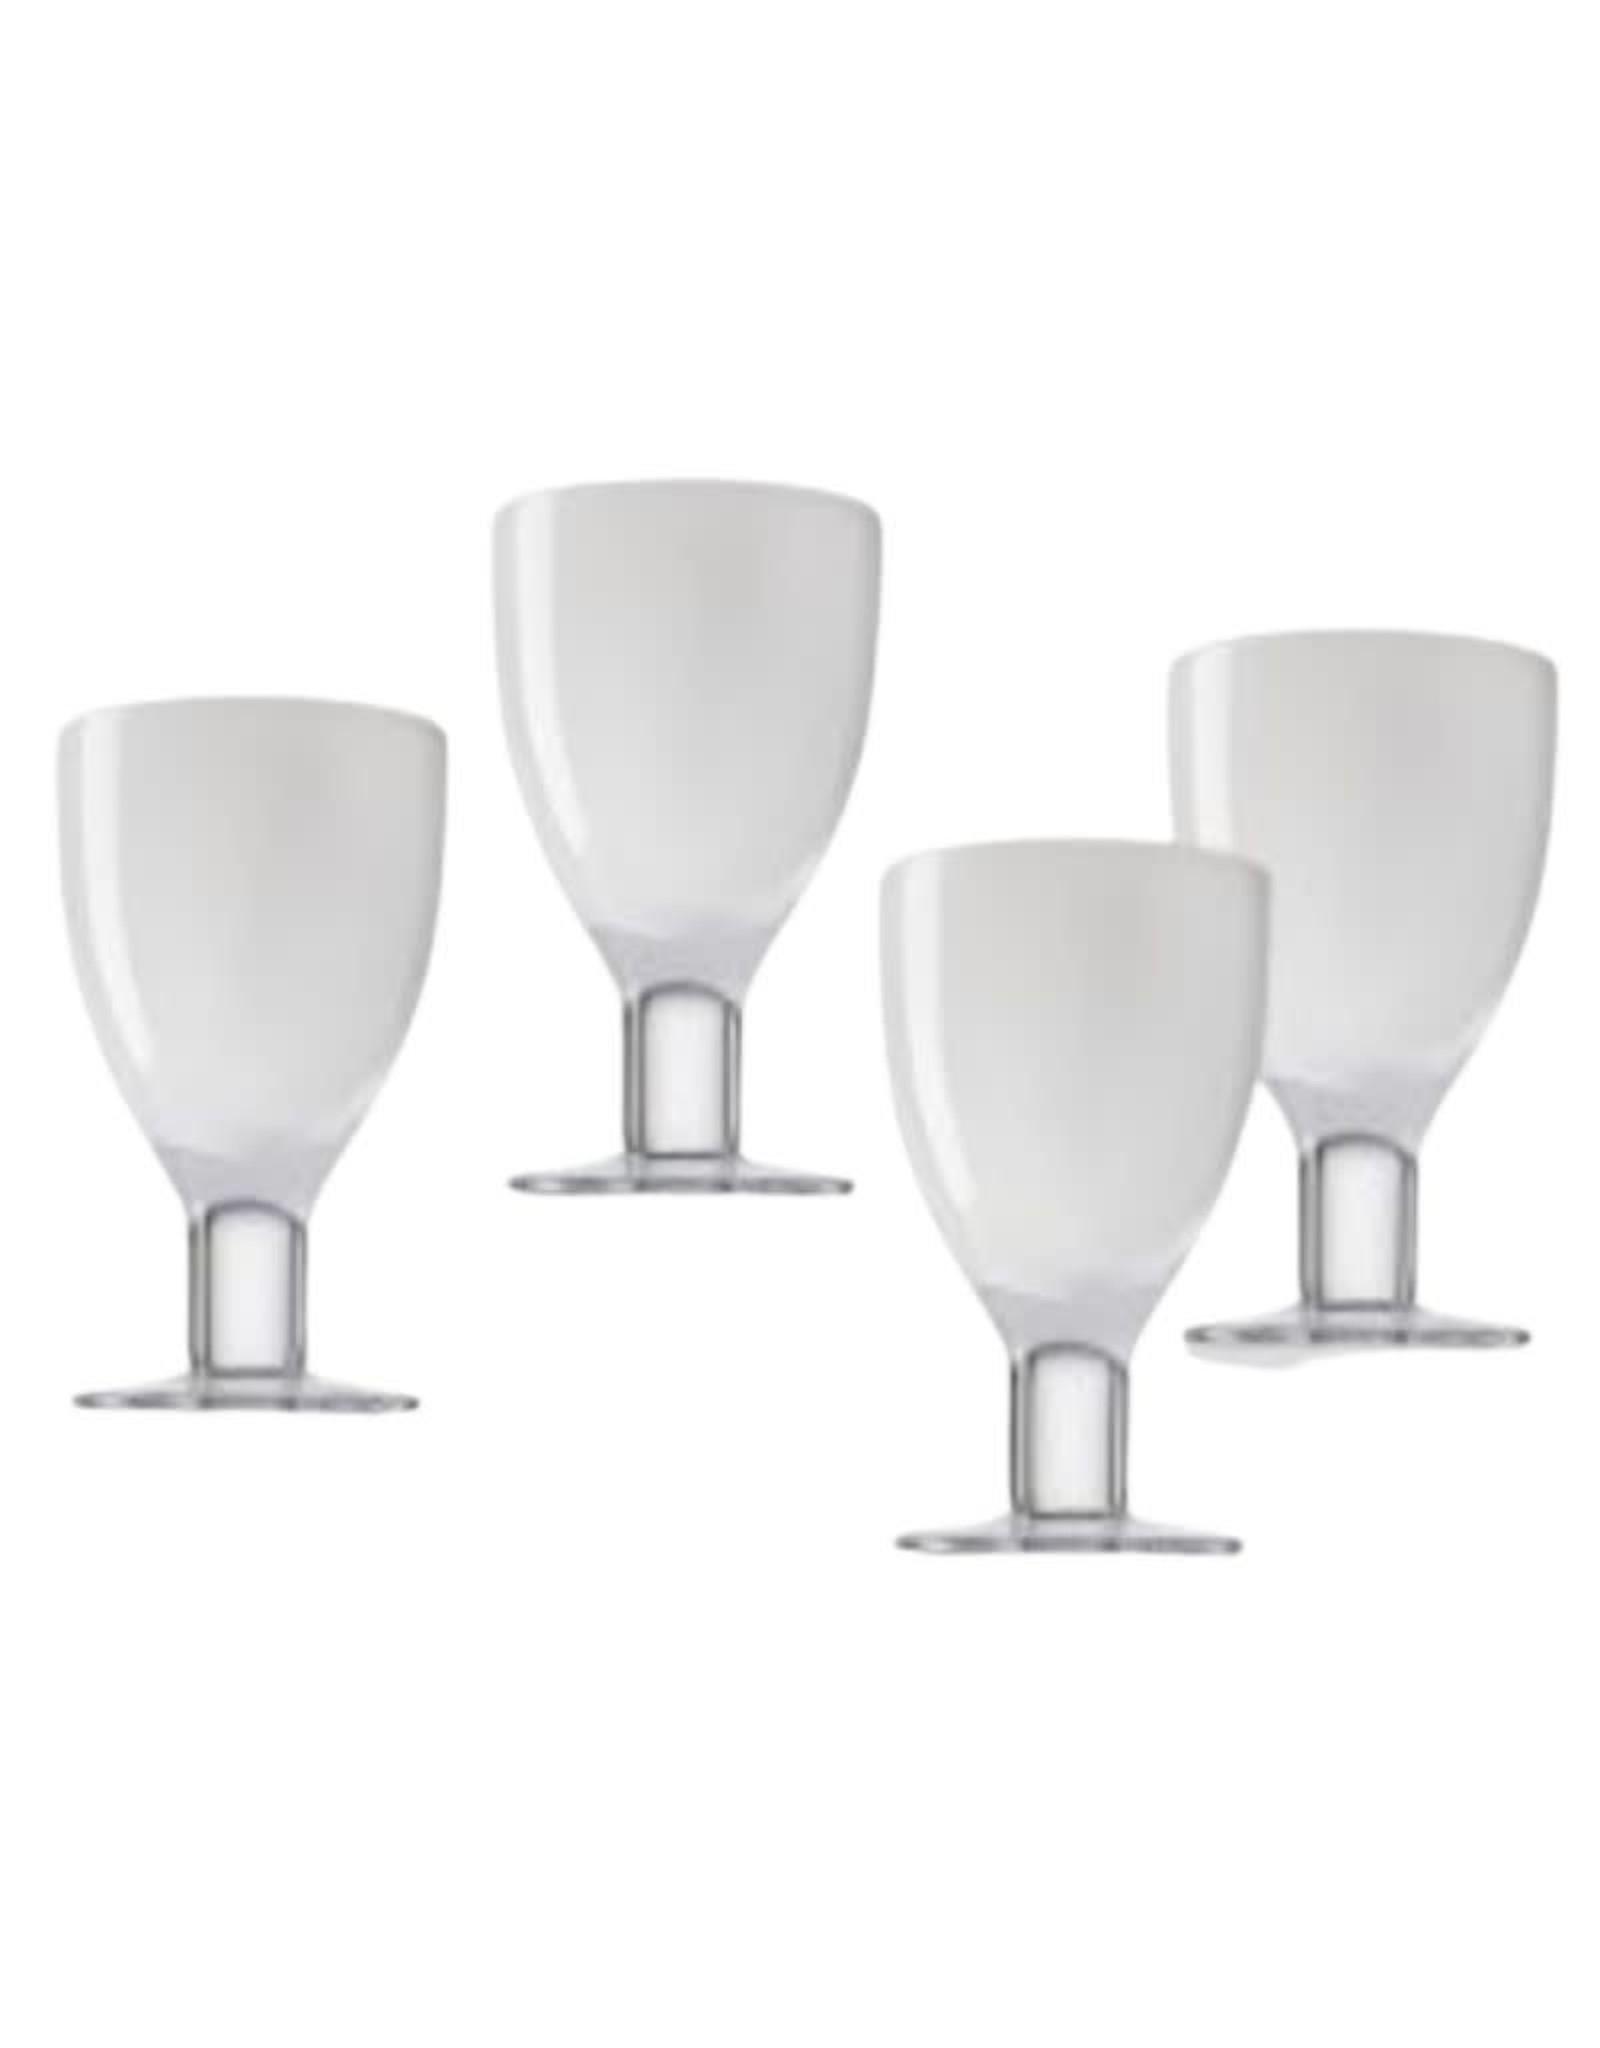 Set of 4 Galley White Glasses-13.5oz